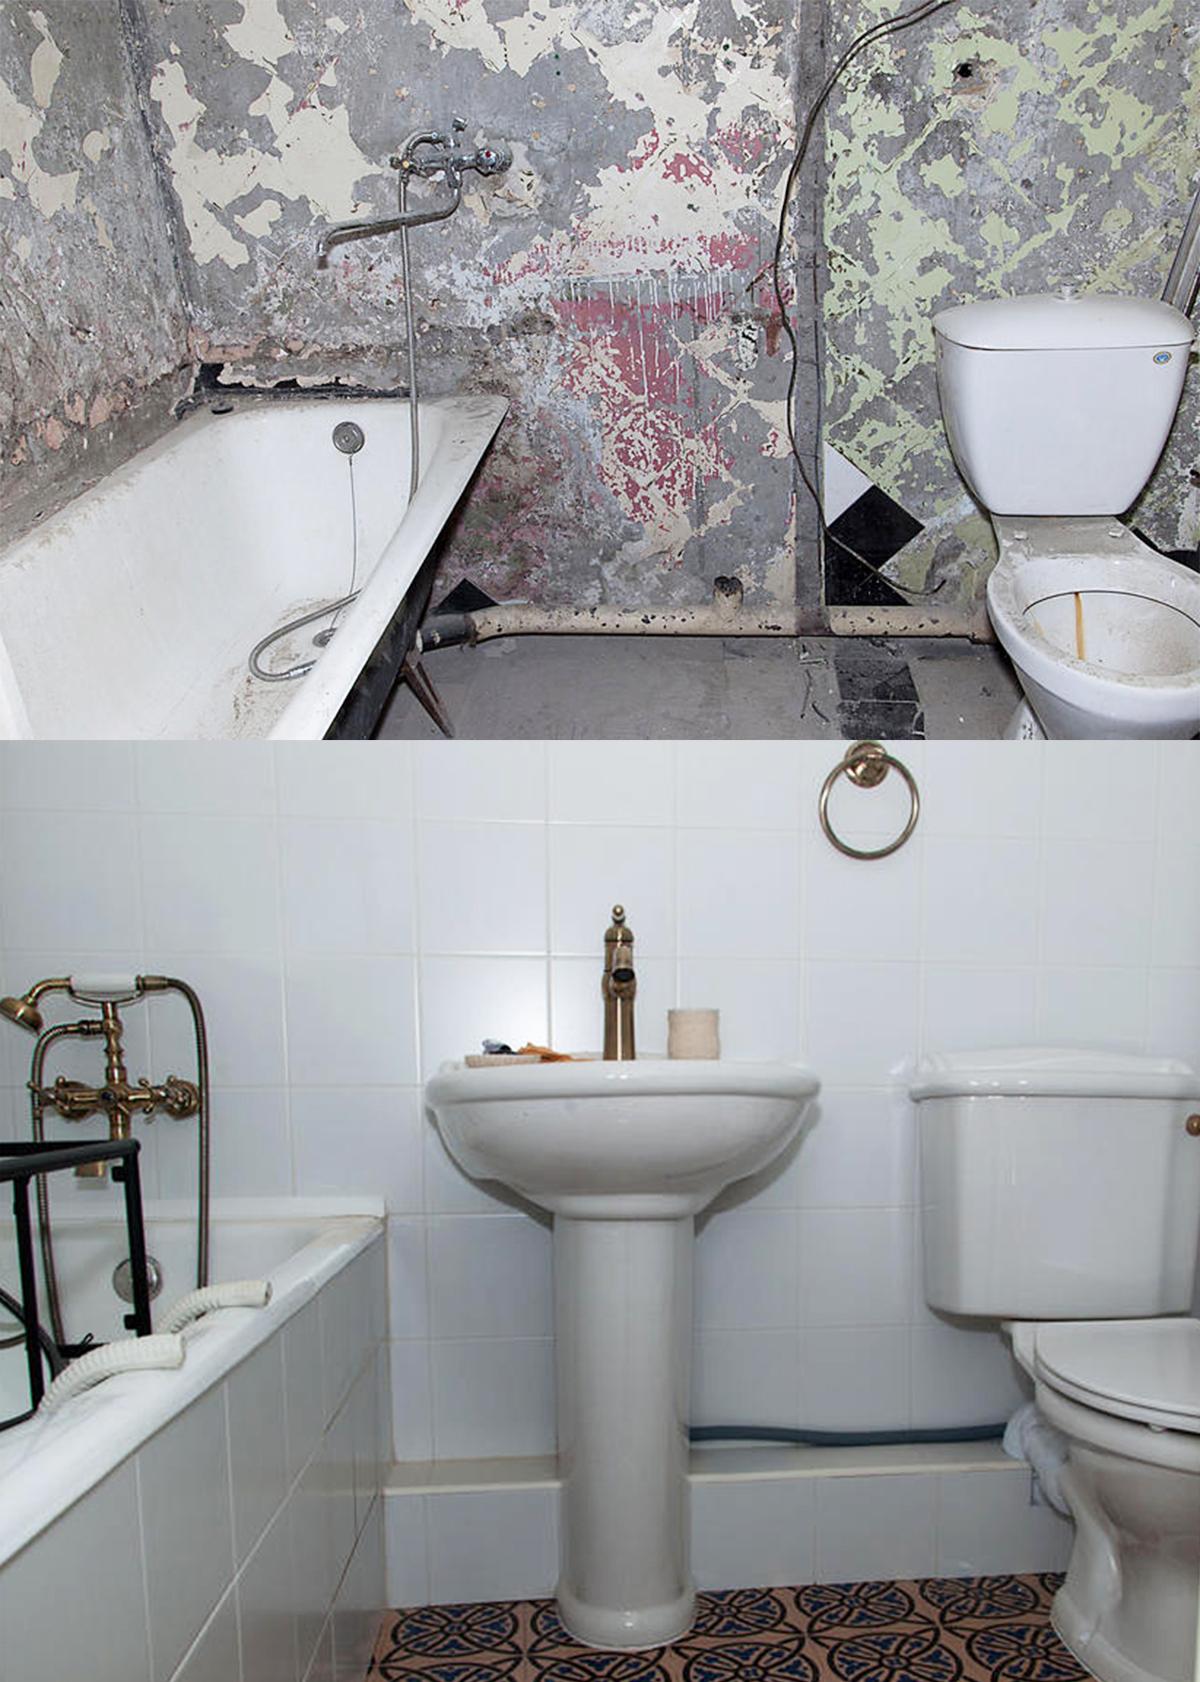 Ванная комната до и после отделки